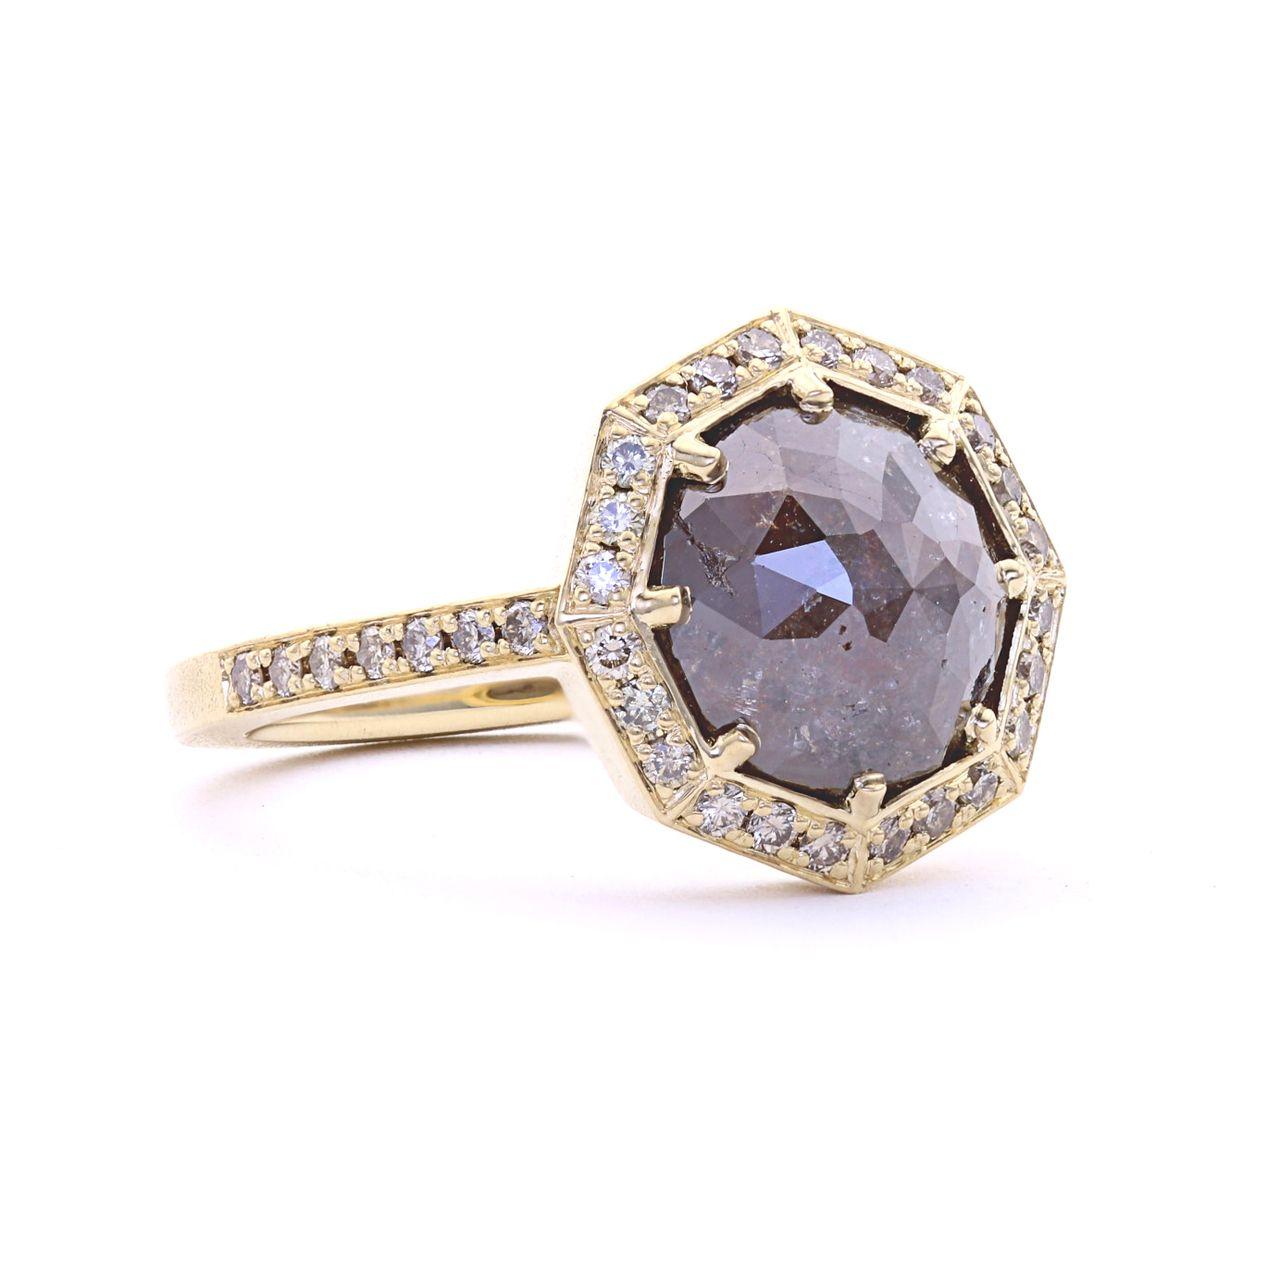 mocha diamond octagonal halo ring | || alternative center stone